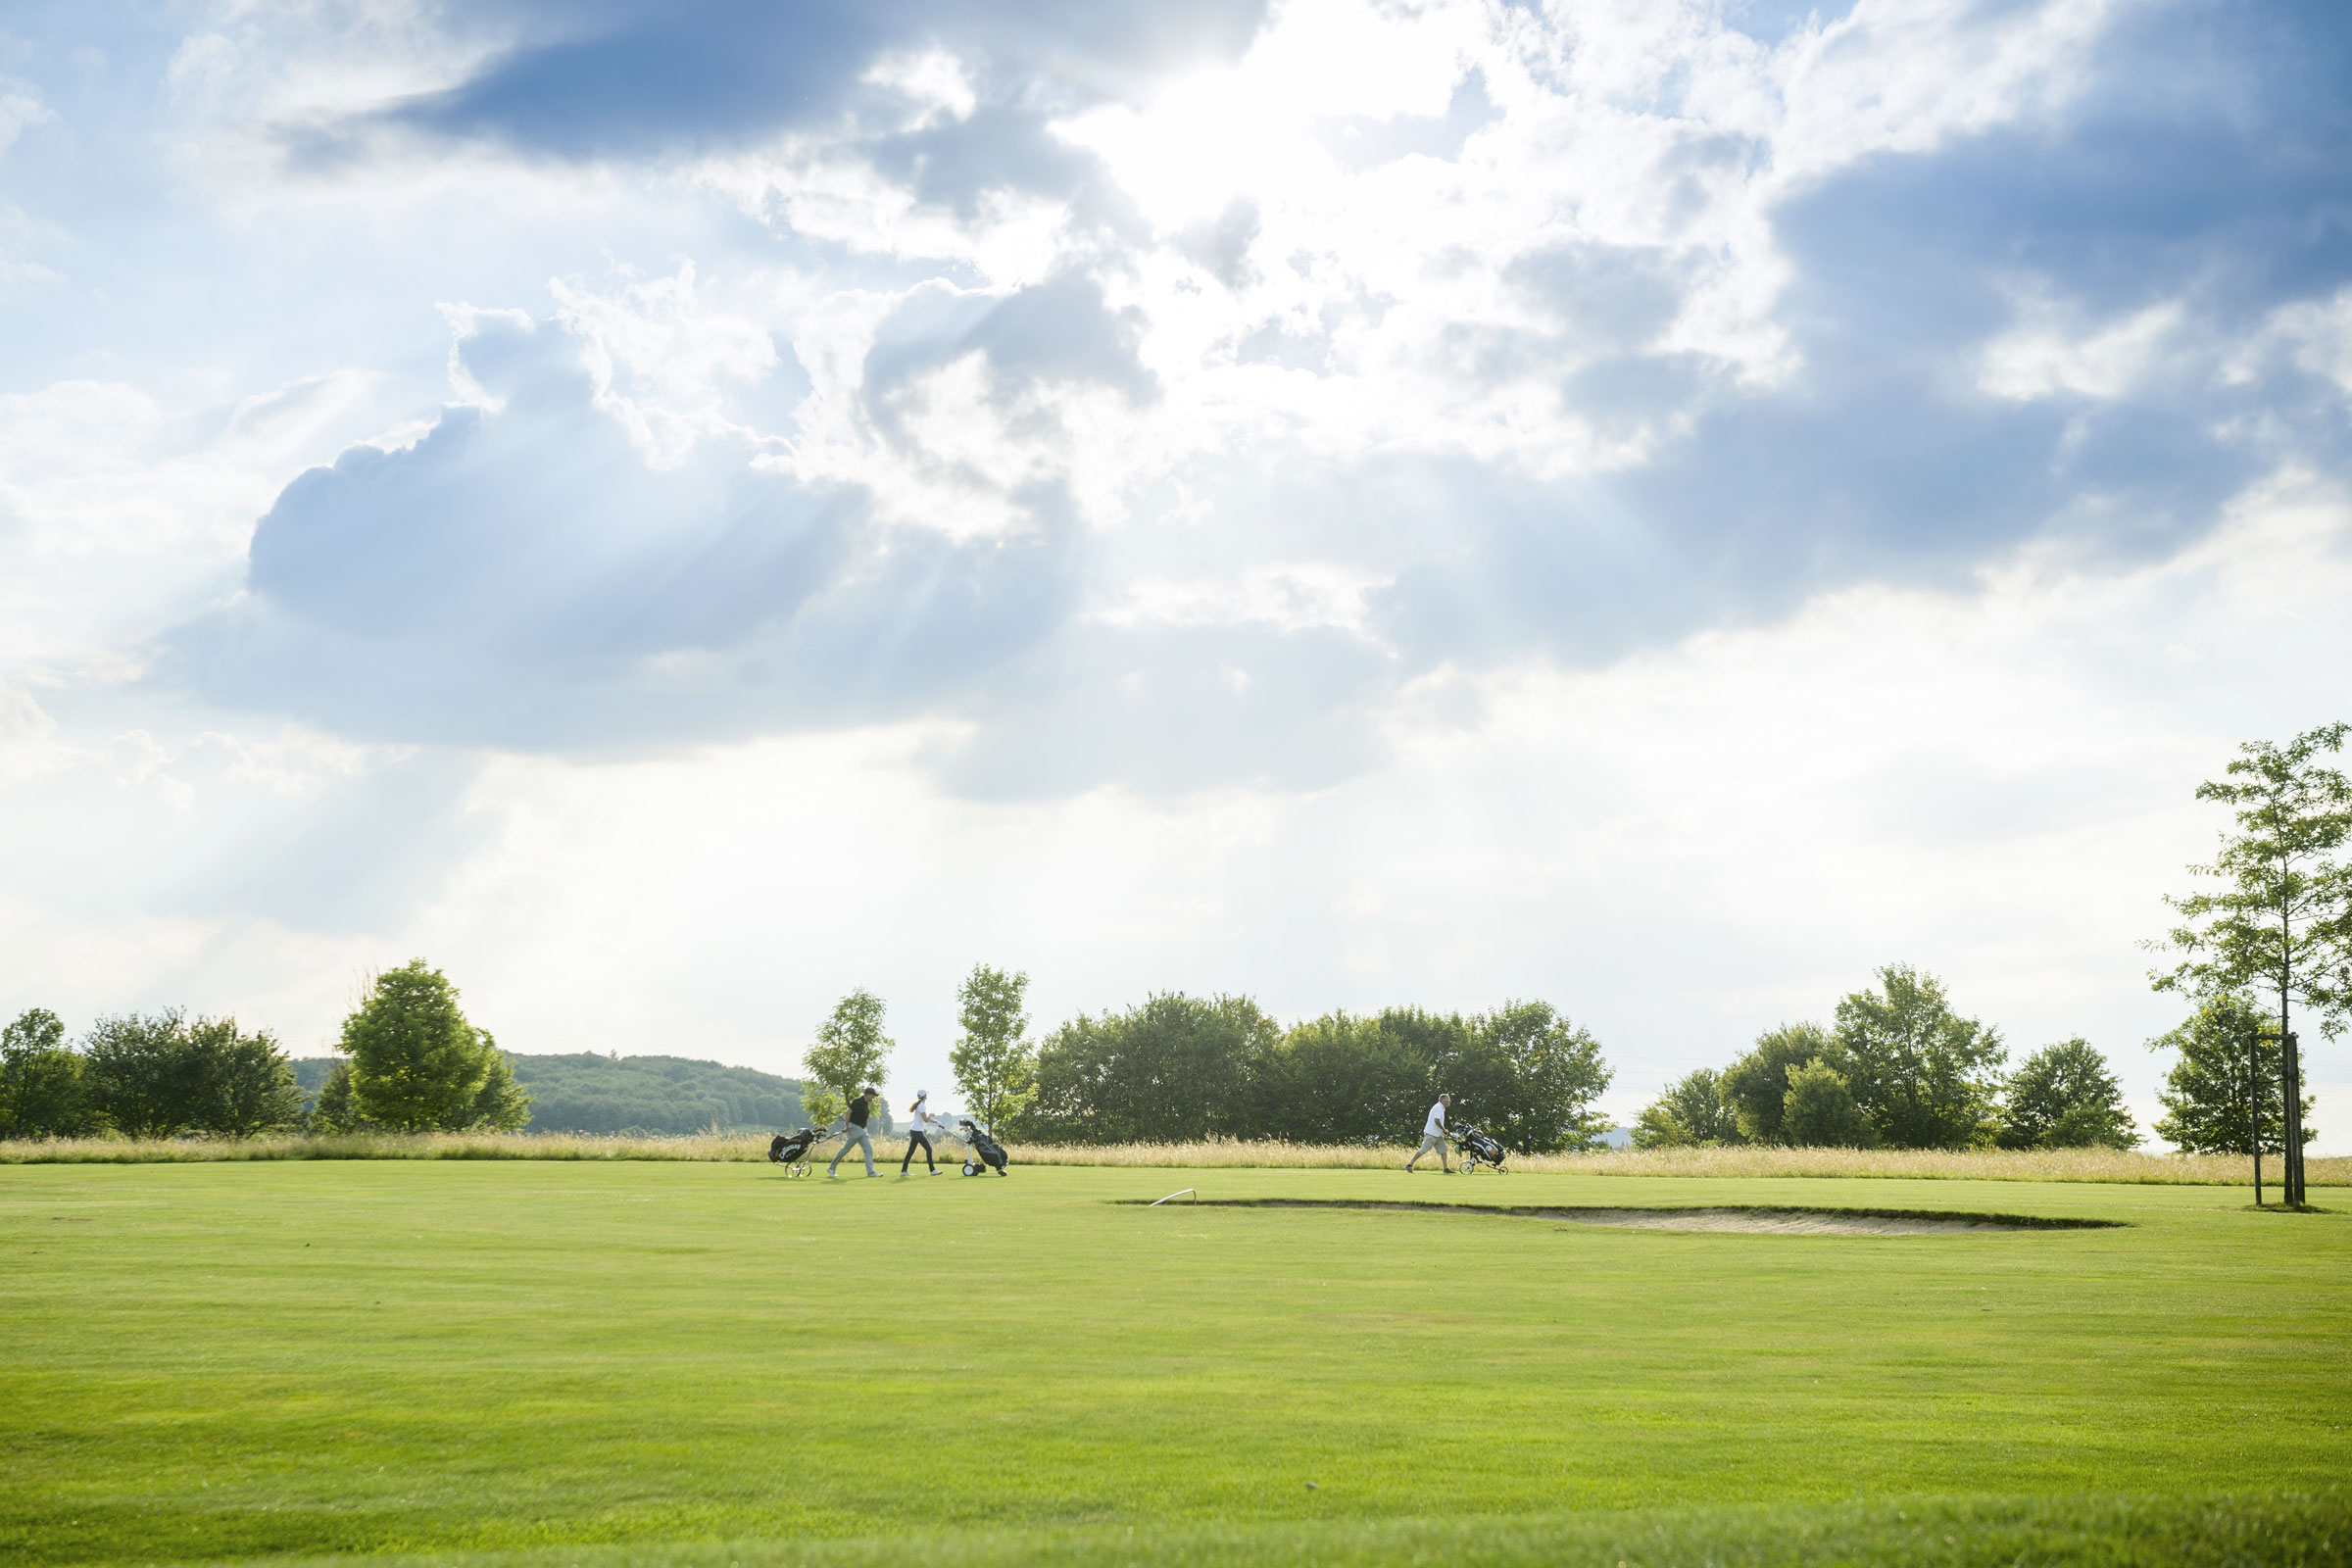 visee_case_golfers-9